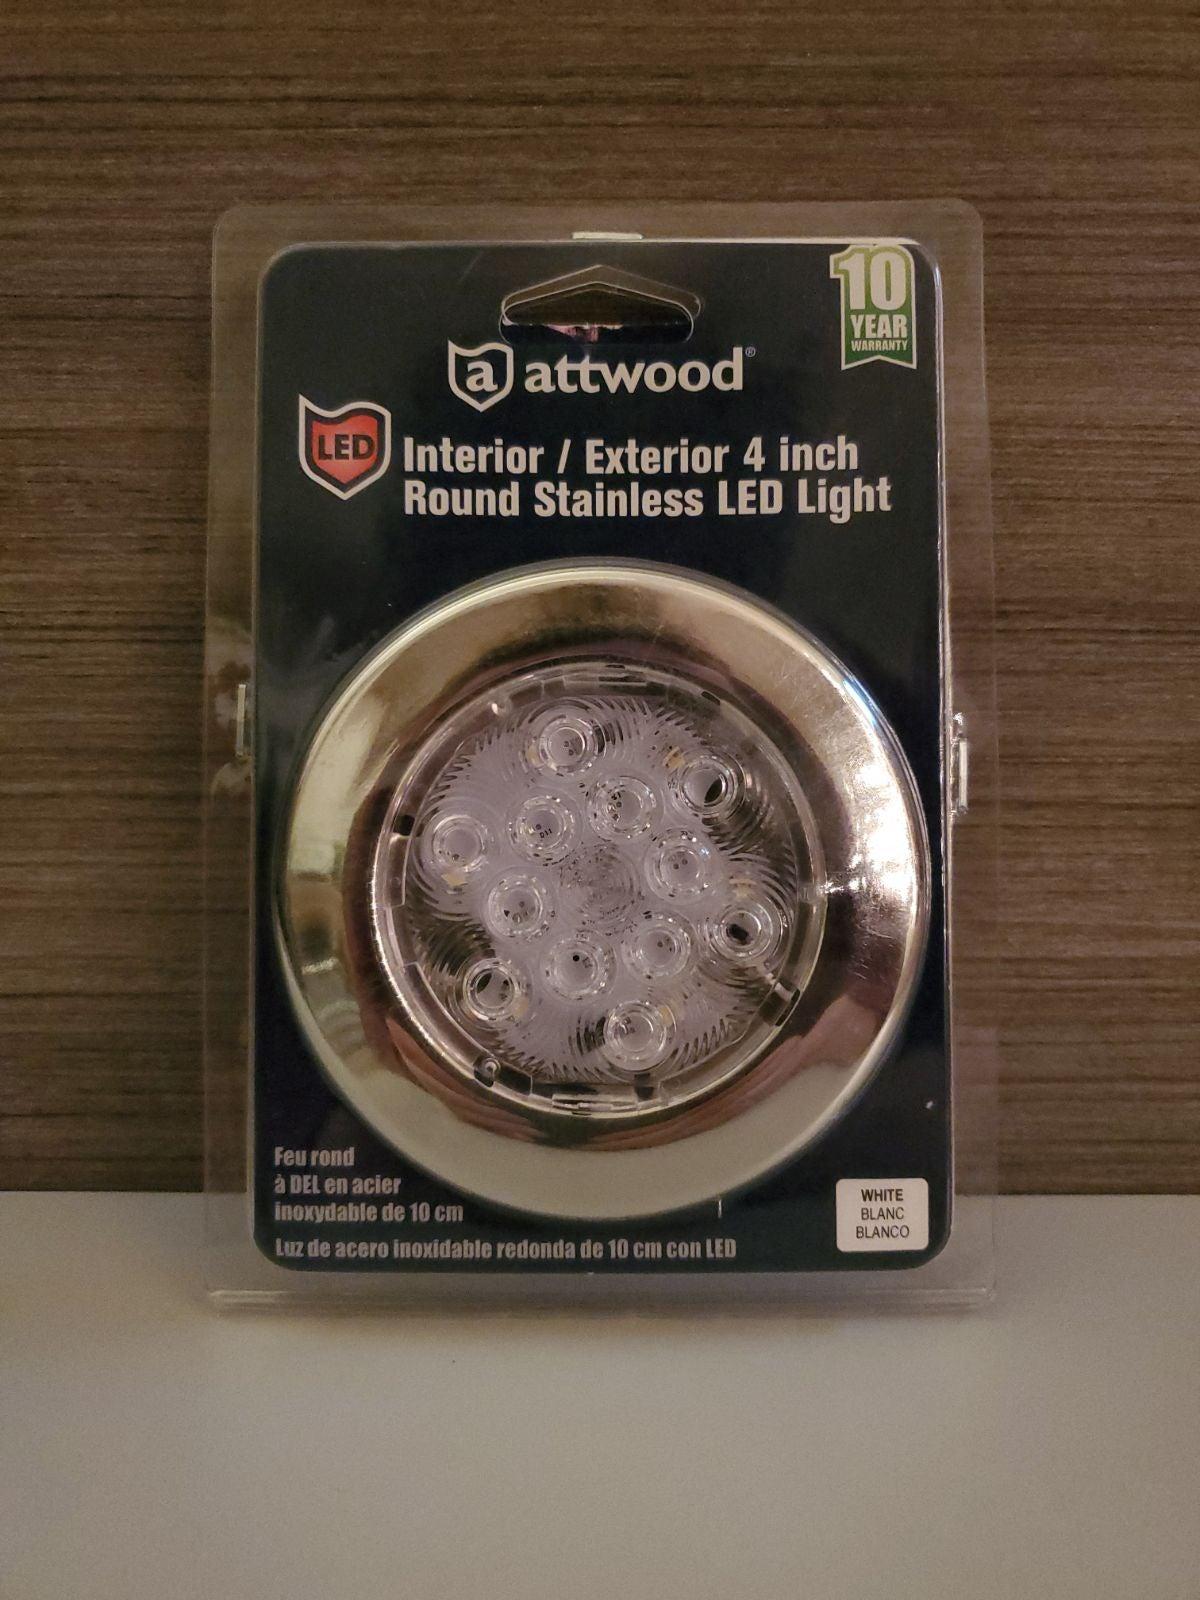 4 inch Stainless LED Light